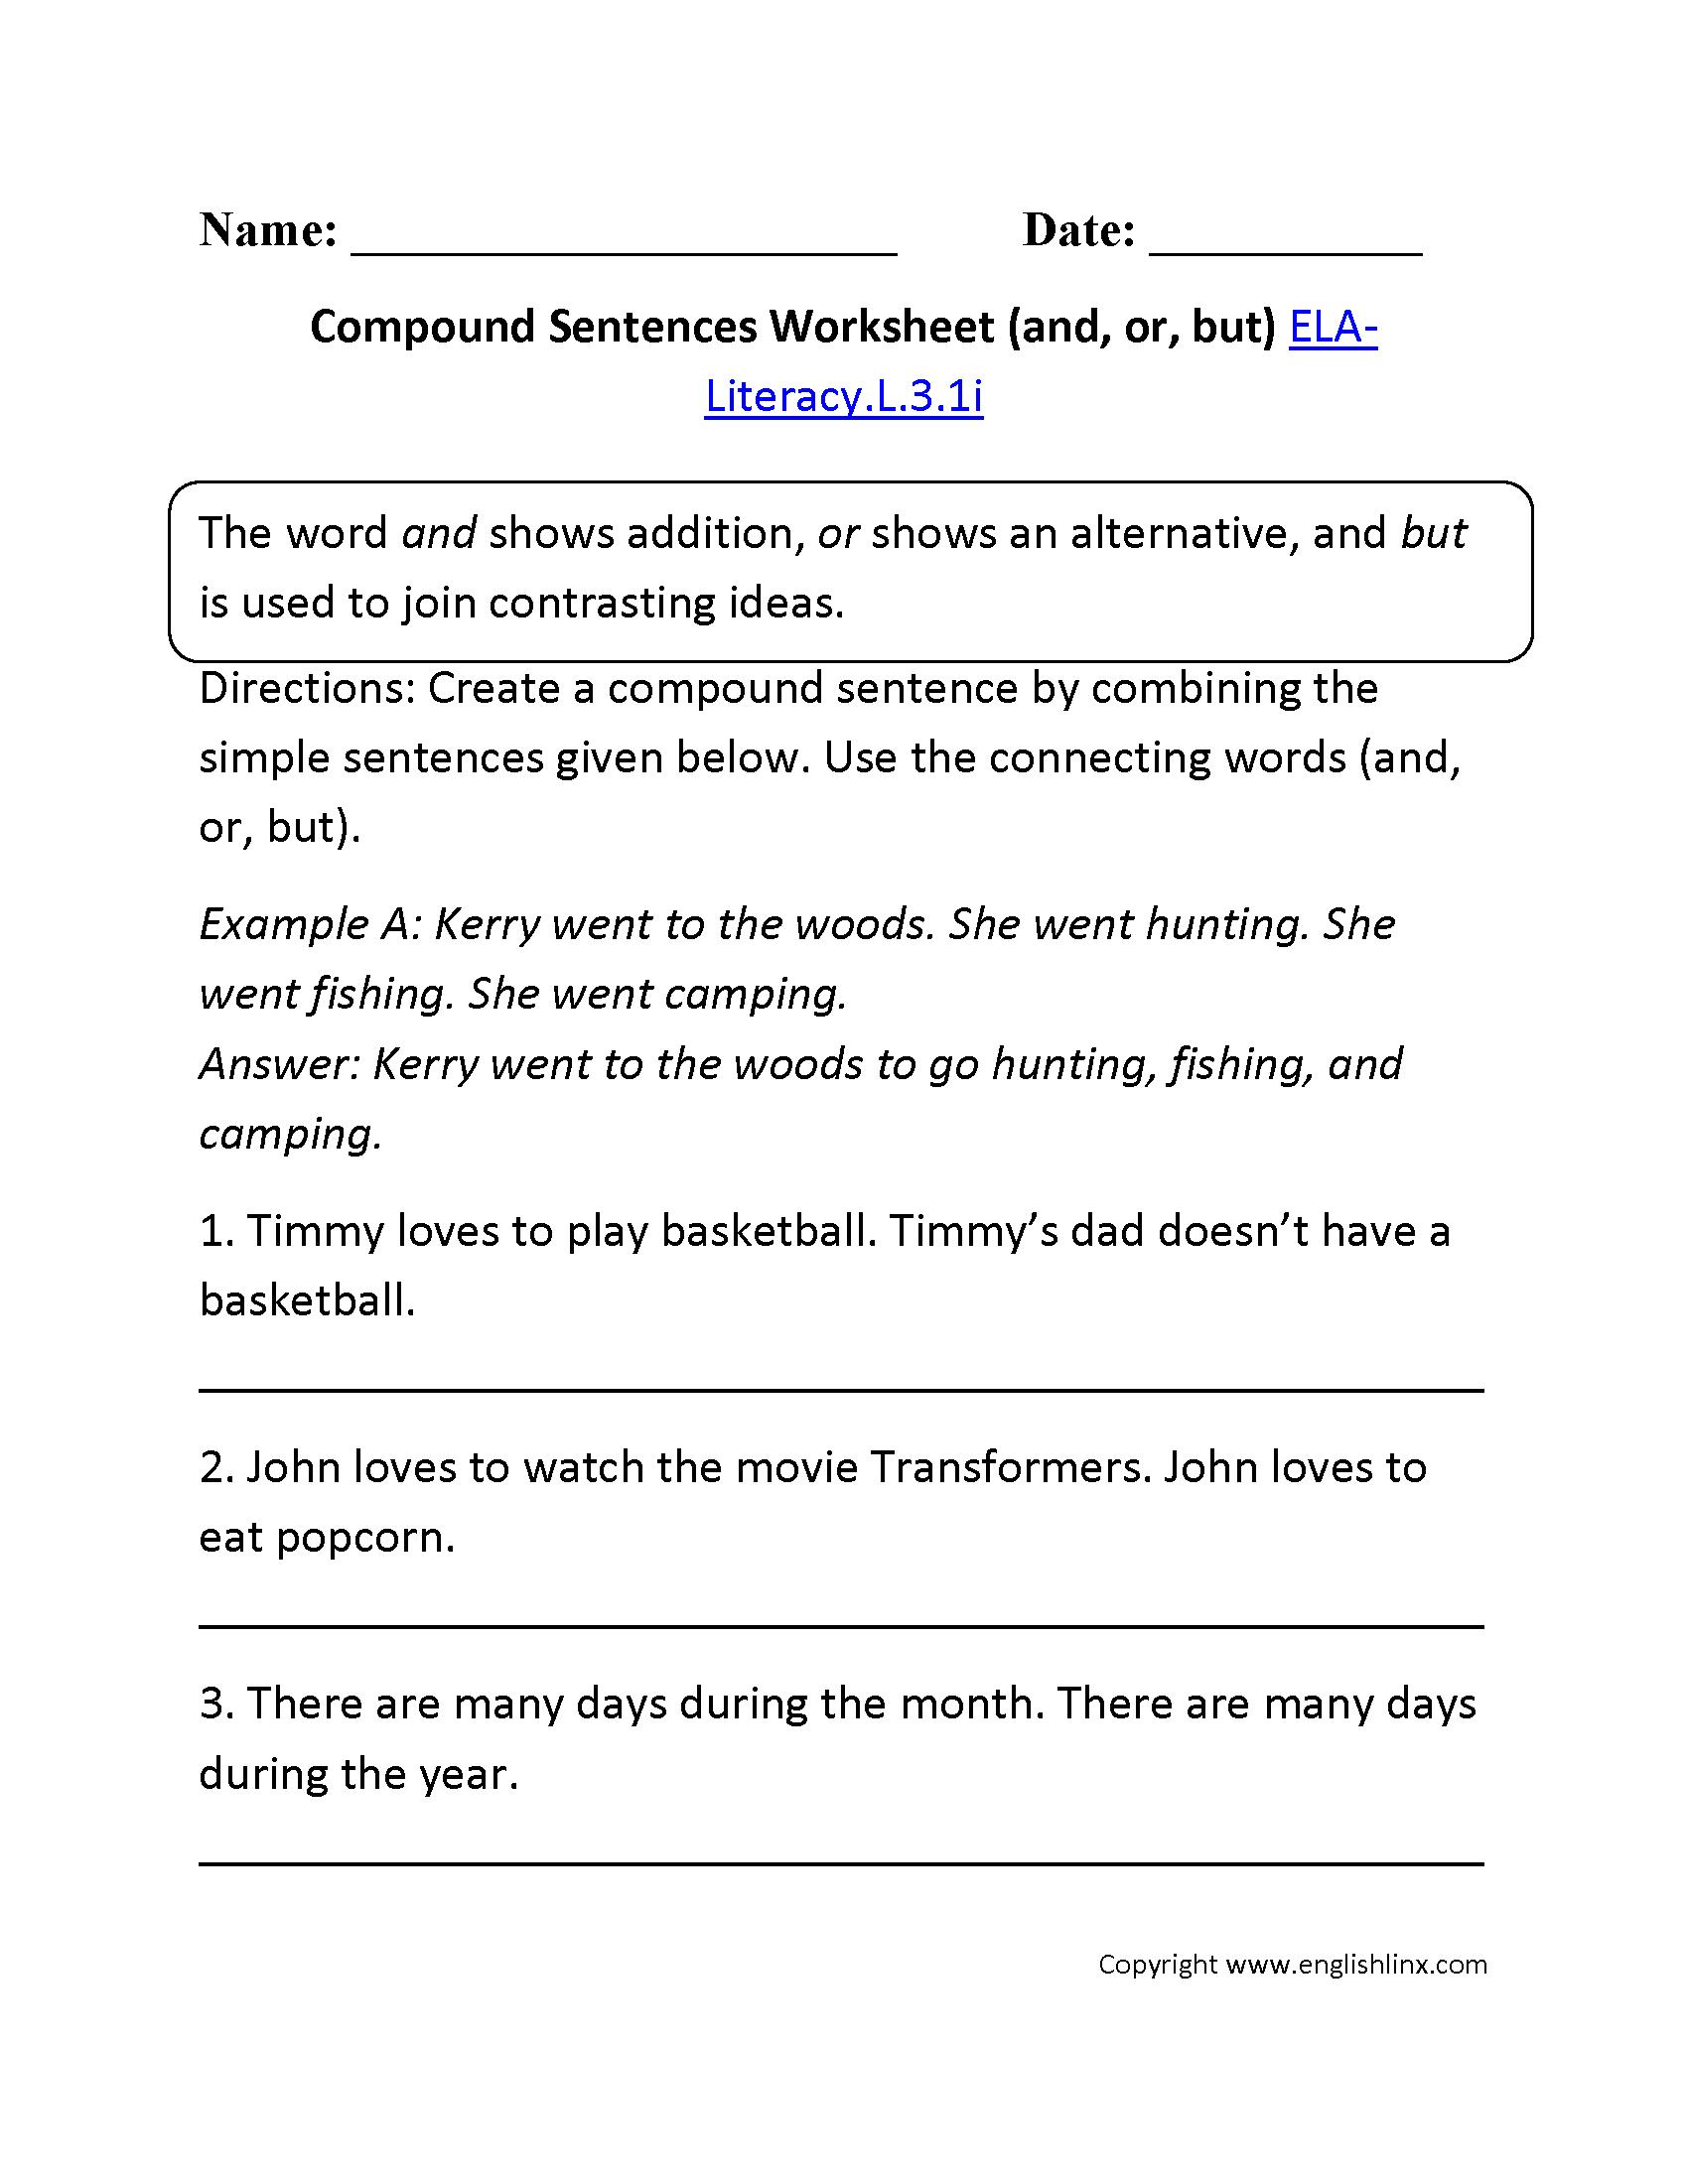 Subject verb agreement sentences worksheet images agreement complex  compound sentence example septic tank leak diagram subject